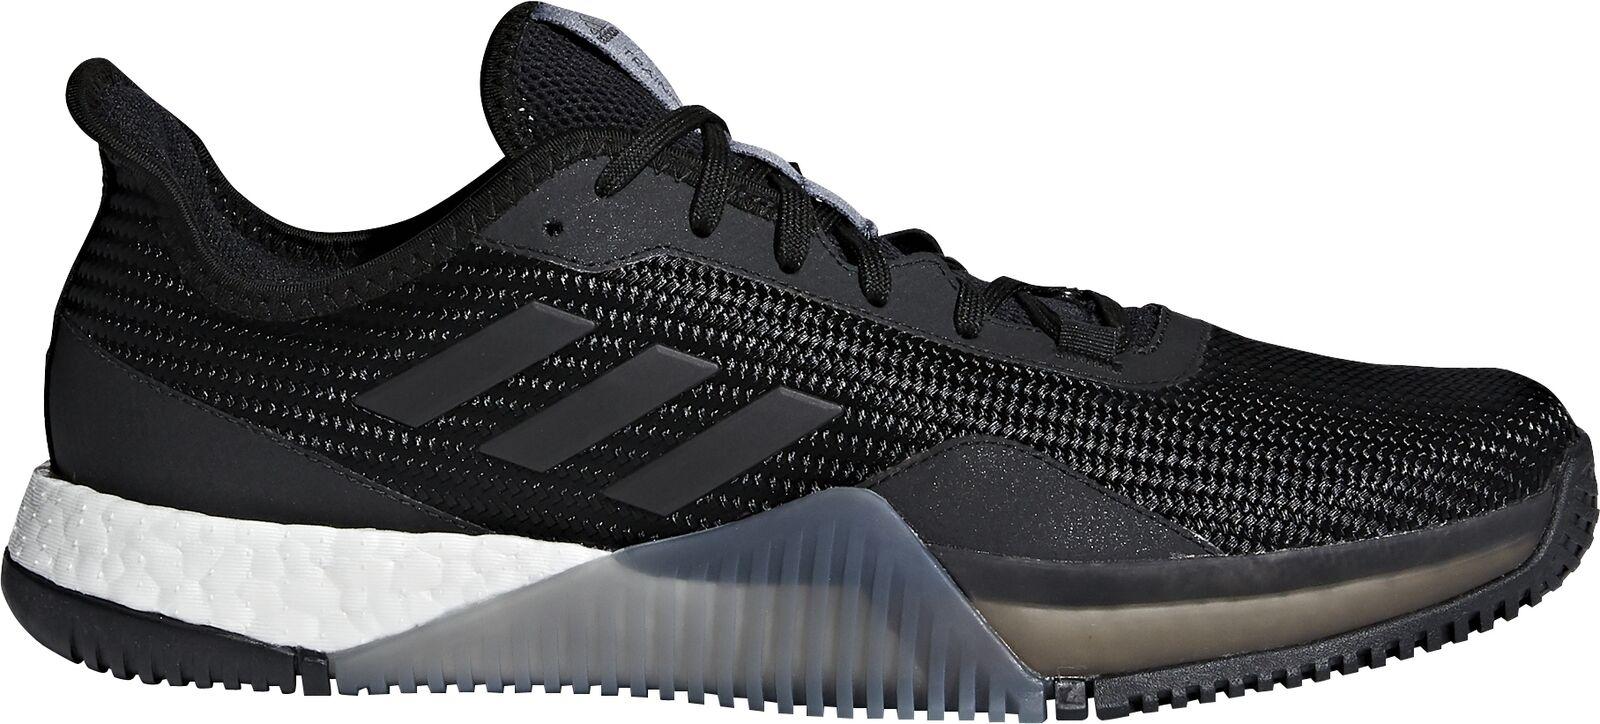 adidas crazytrain elite scarpe